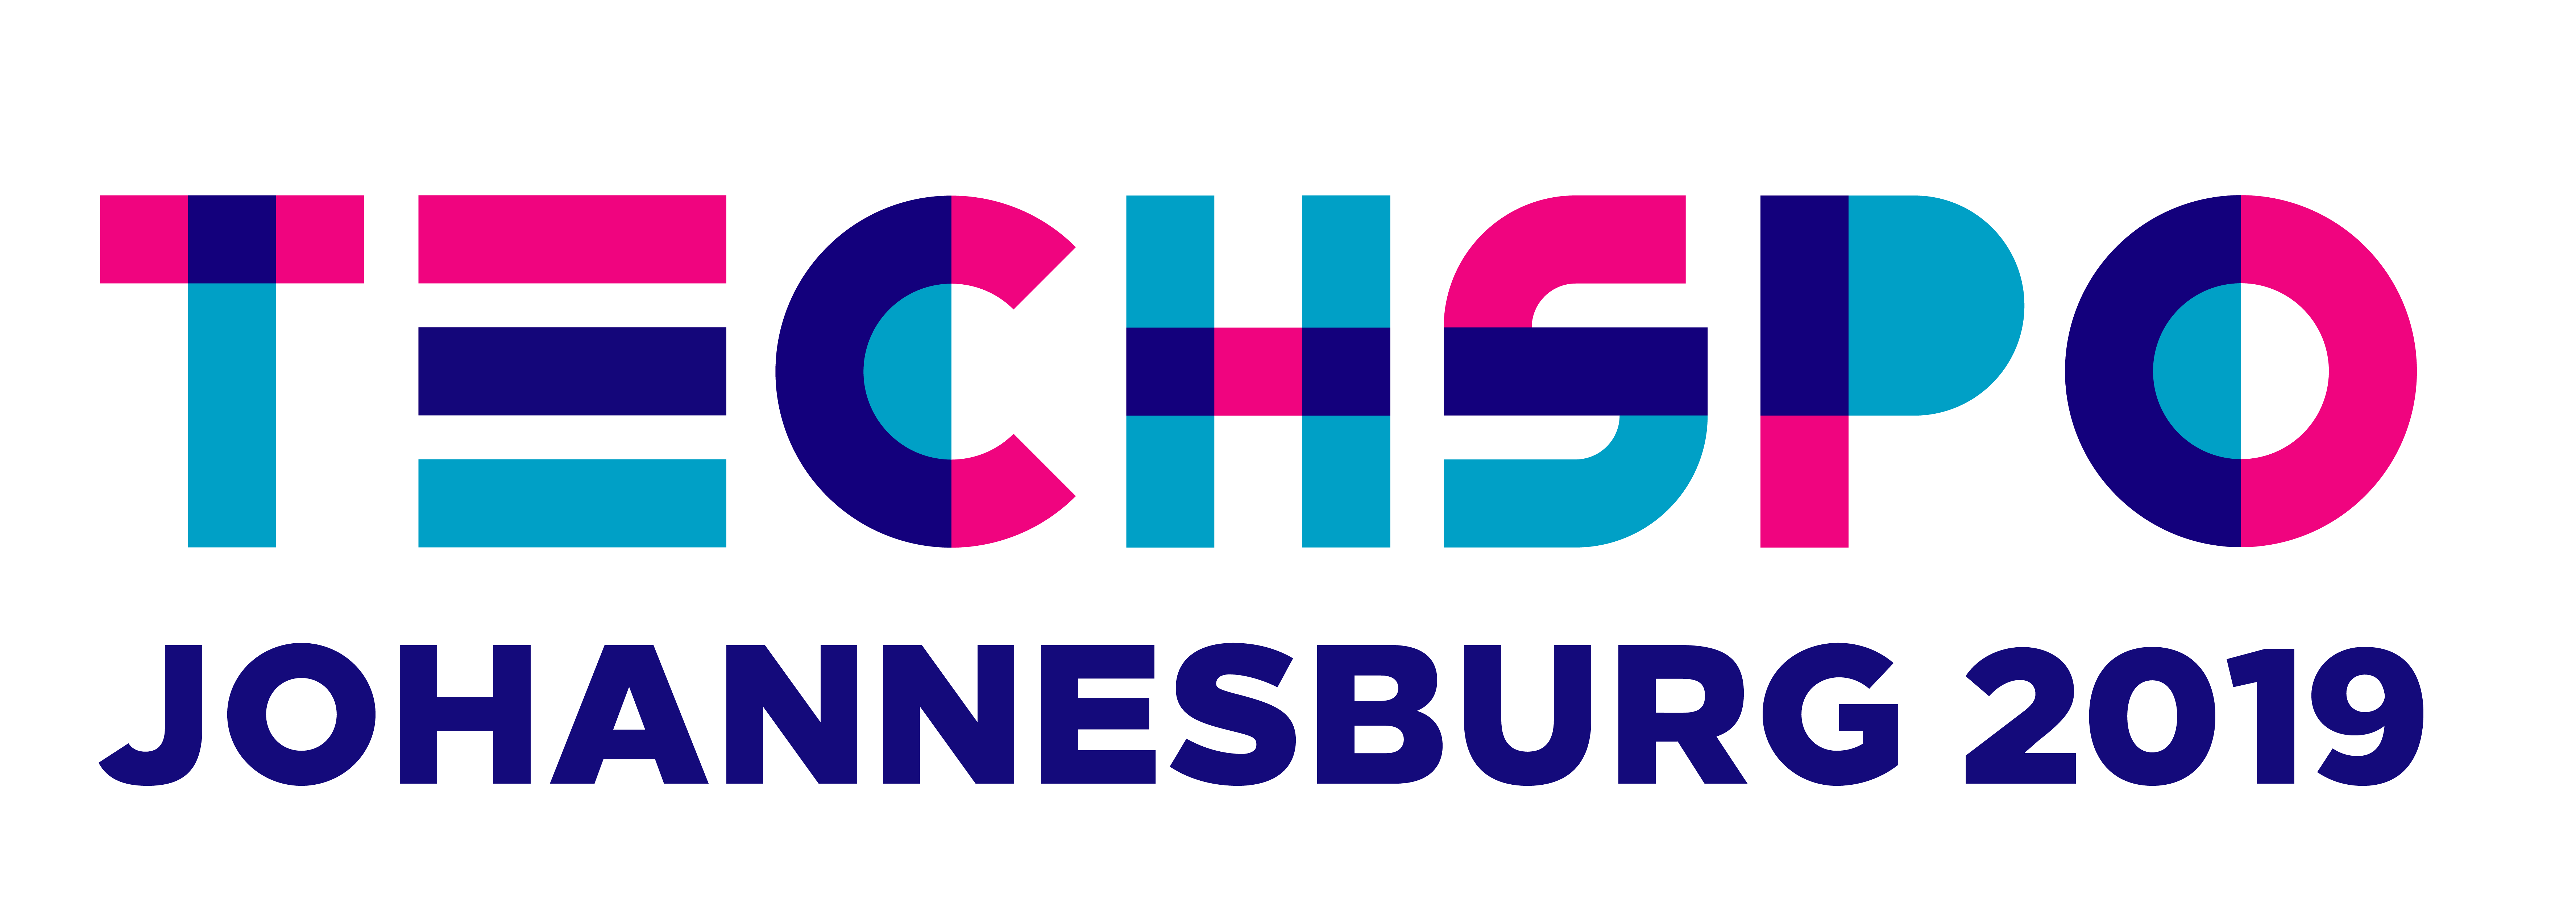 TECHSPO Johannesburg 2021